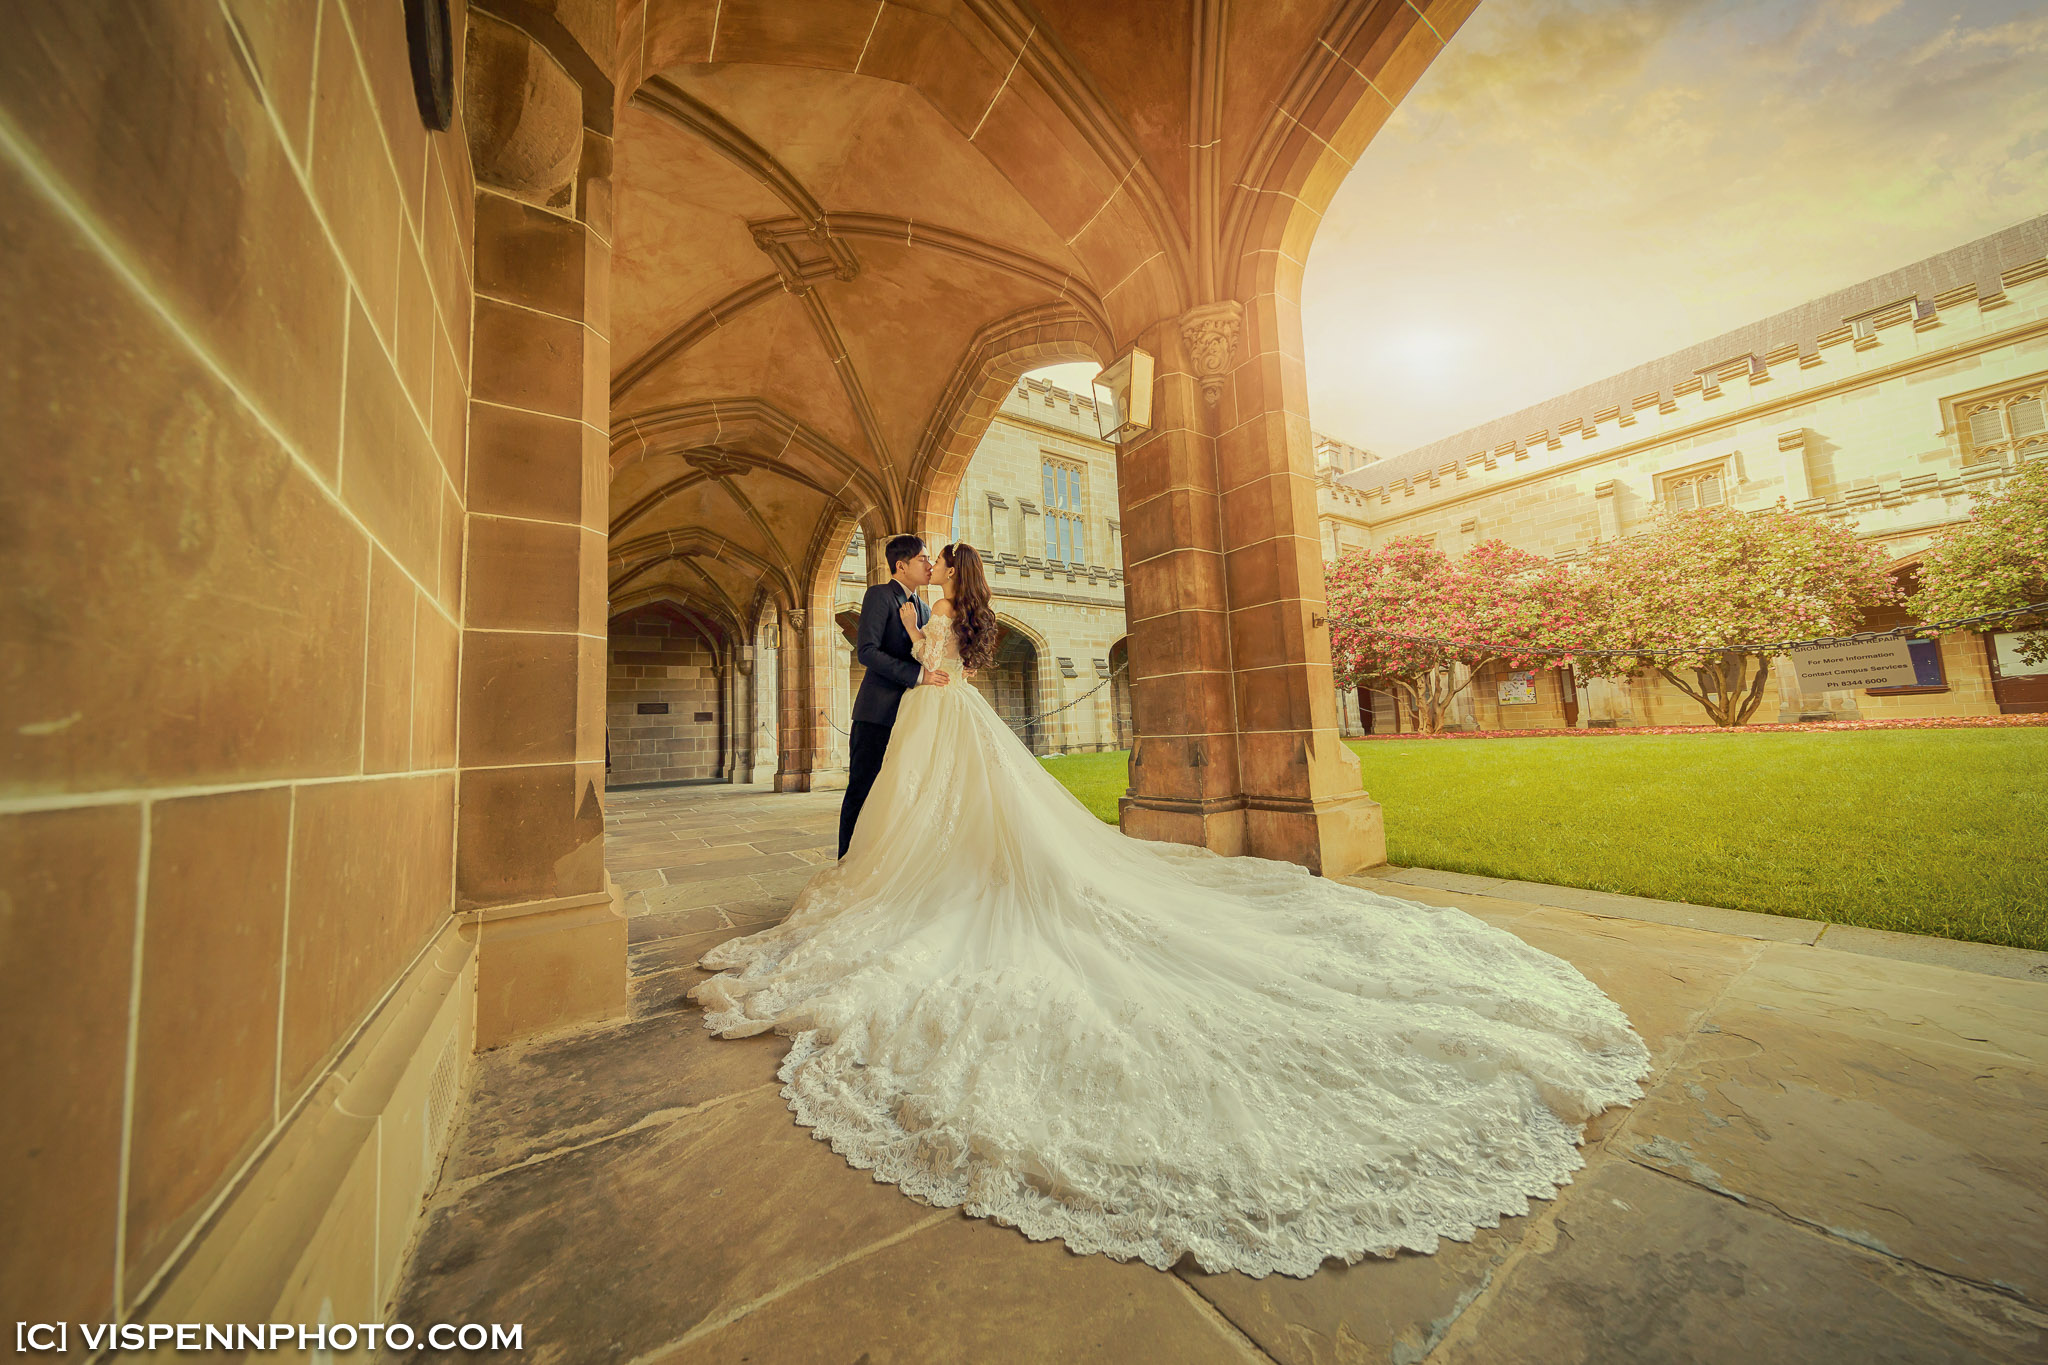 PRE WEDDING Photography Melbourne ZHPENN JackySerena 0427 1